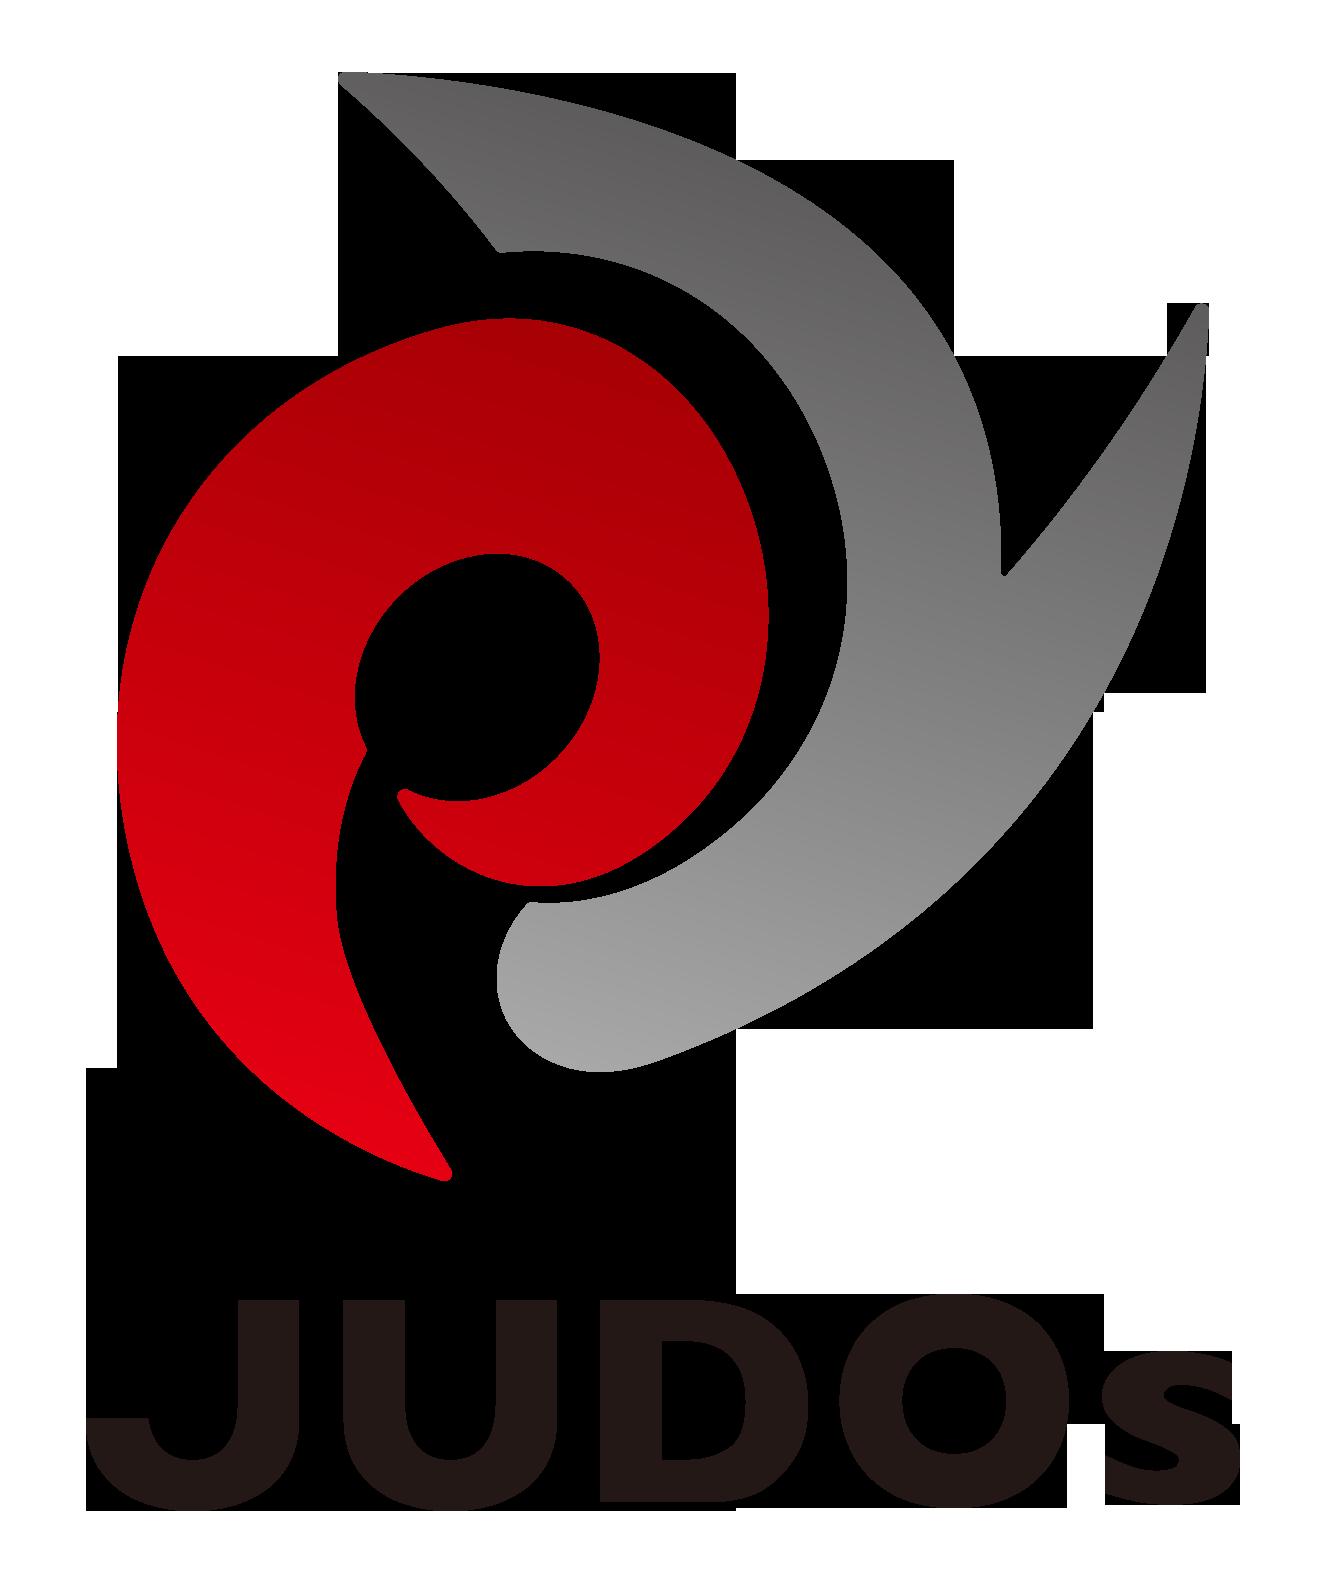 JUDOsロゴ